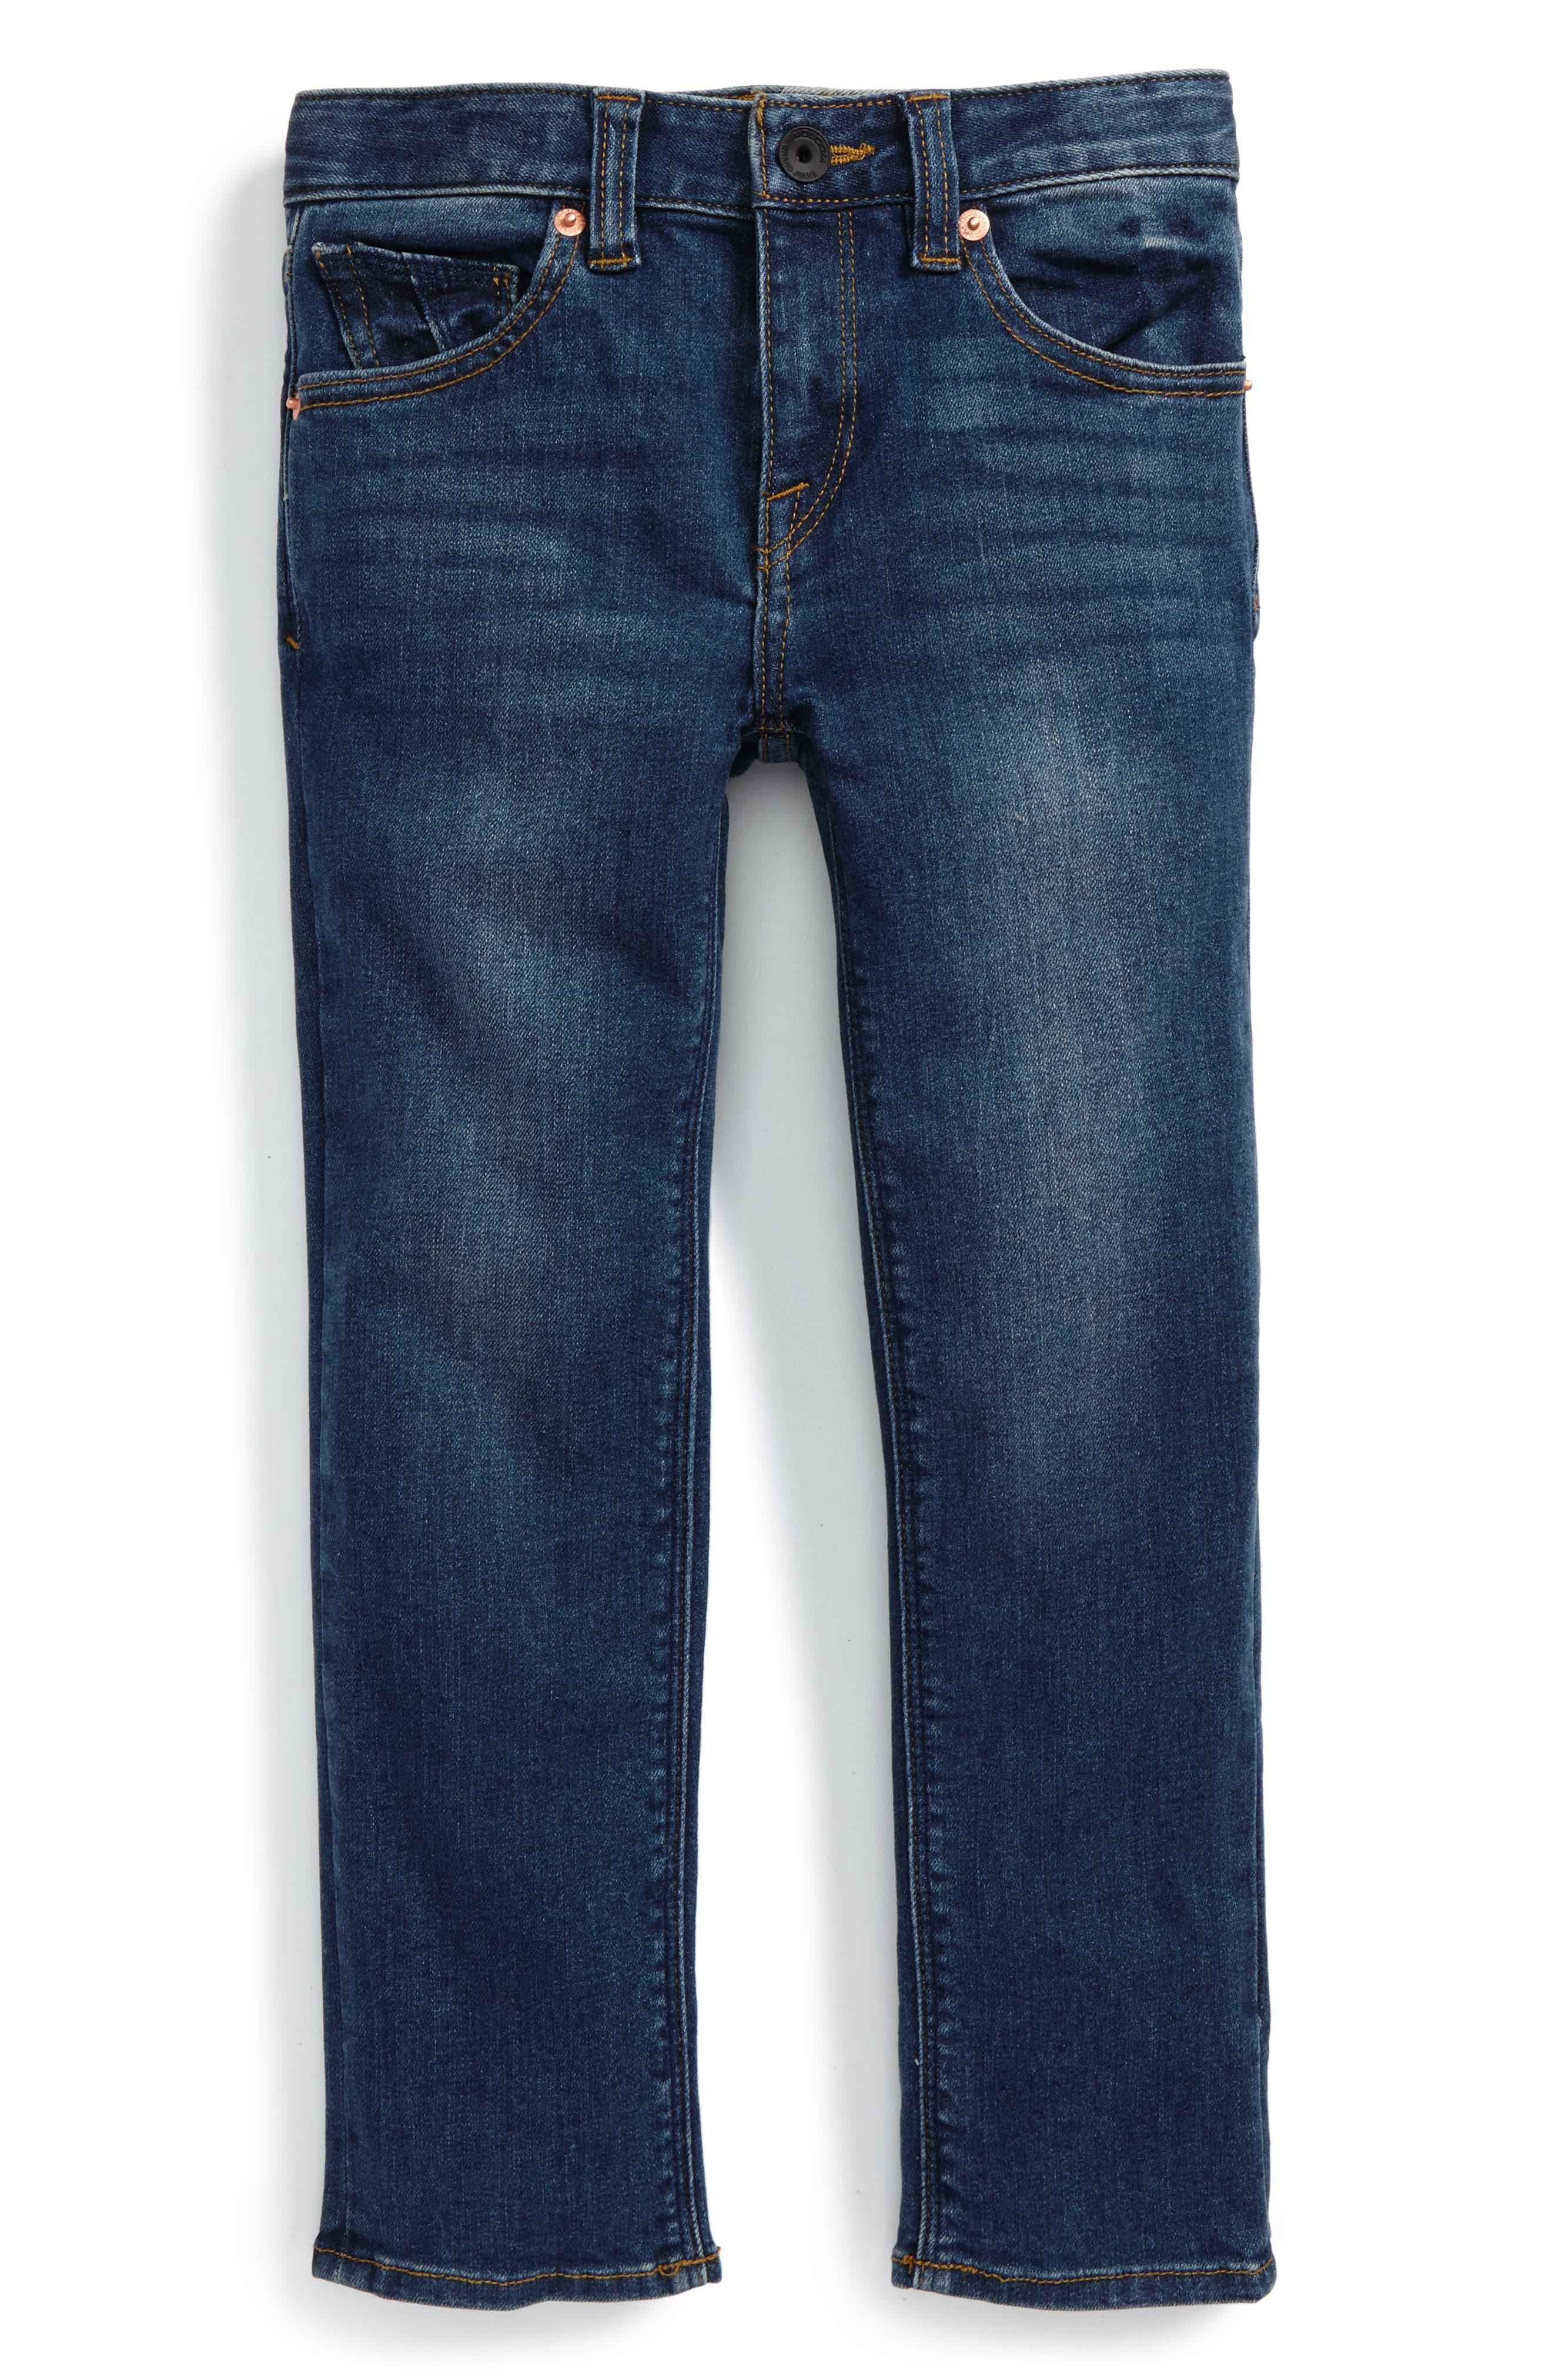 Main Image - Volcom 'Vorta' Slim Fit Jeans (Toddler Boys & Little Boys)